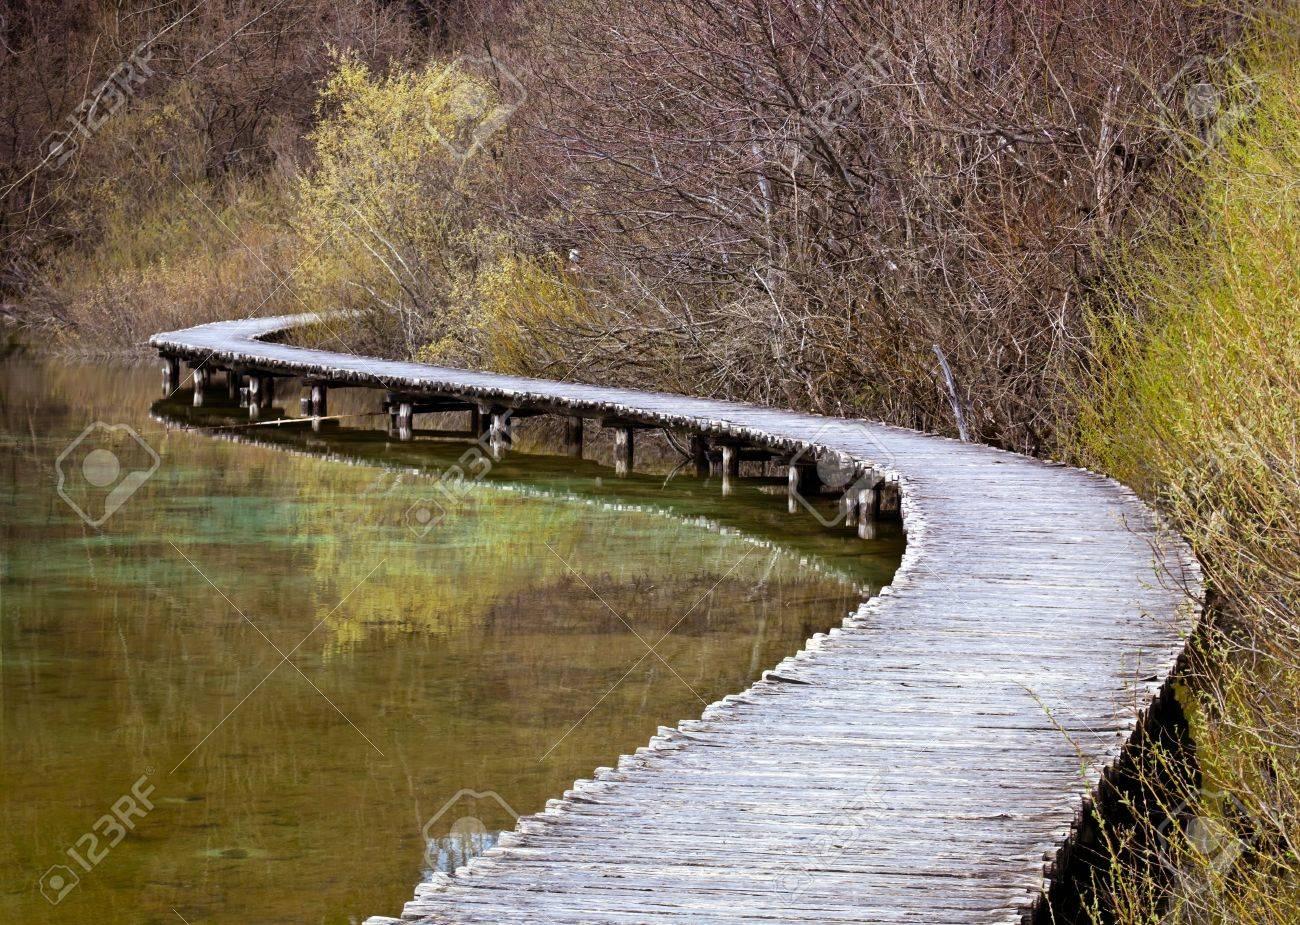 Curved wooden path in the Plitvice lakes (Plitvicka jezera) national park, Croatia, Europe. Season: Early spring. - 4700079